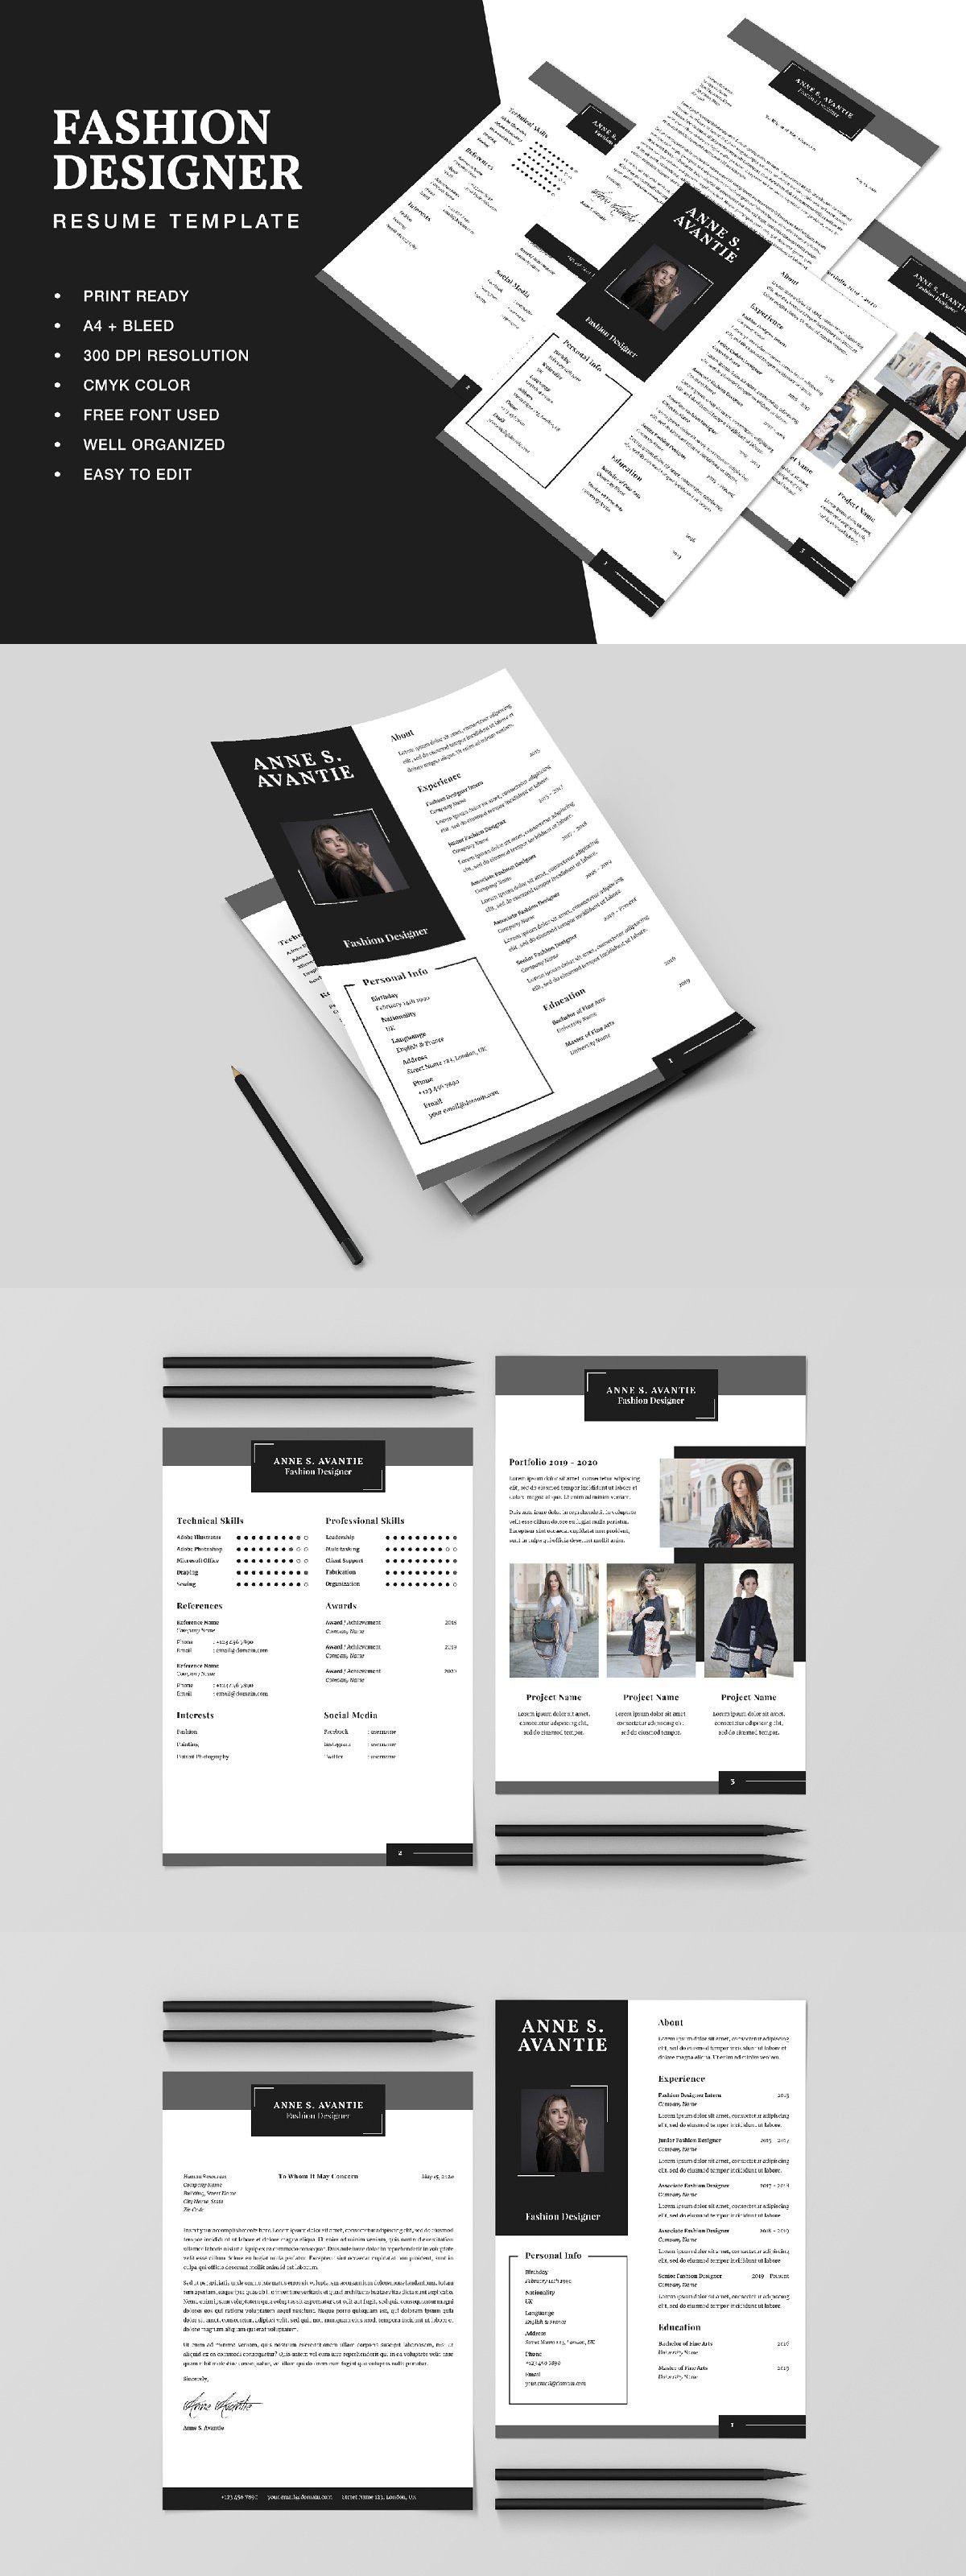 Fashion designer resume cv template resume design